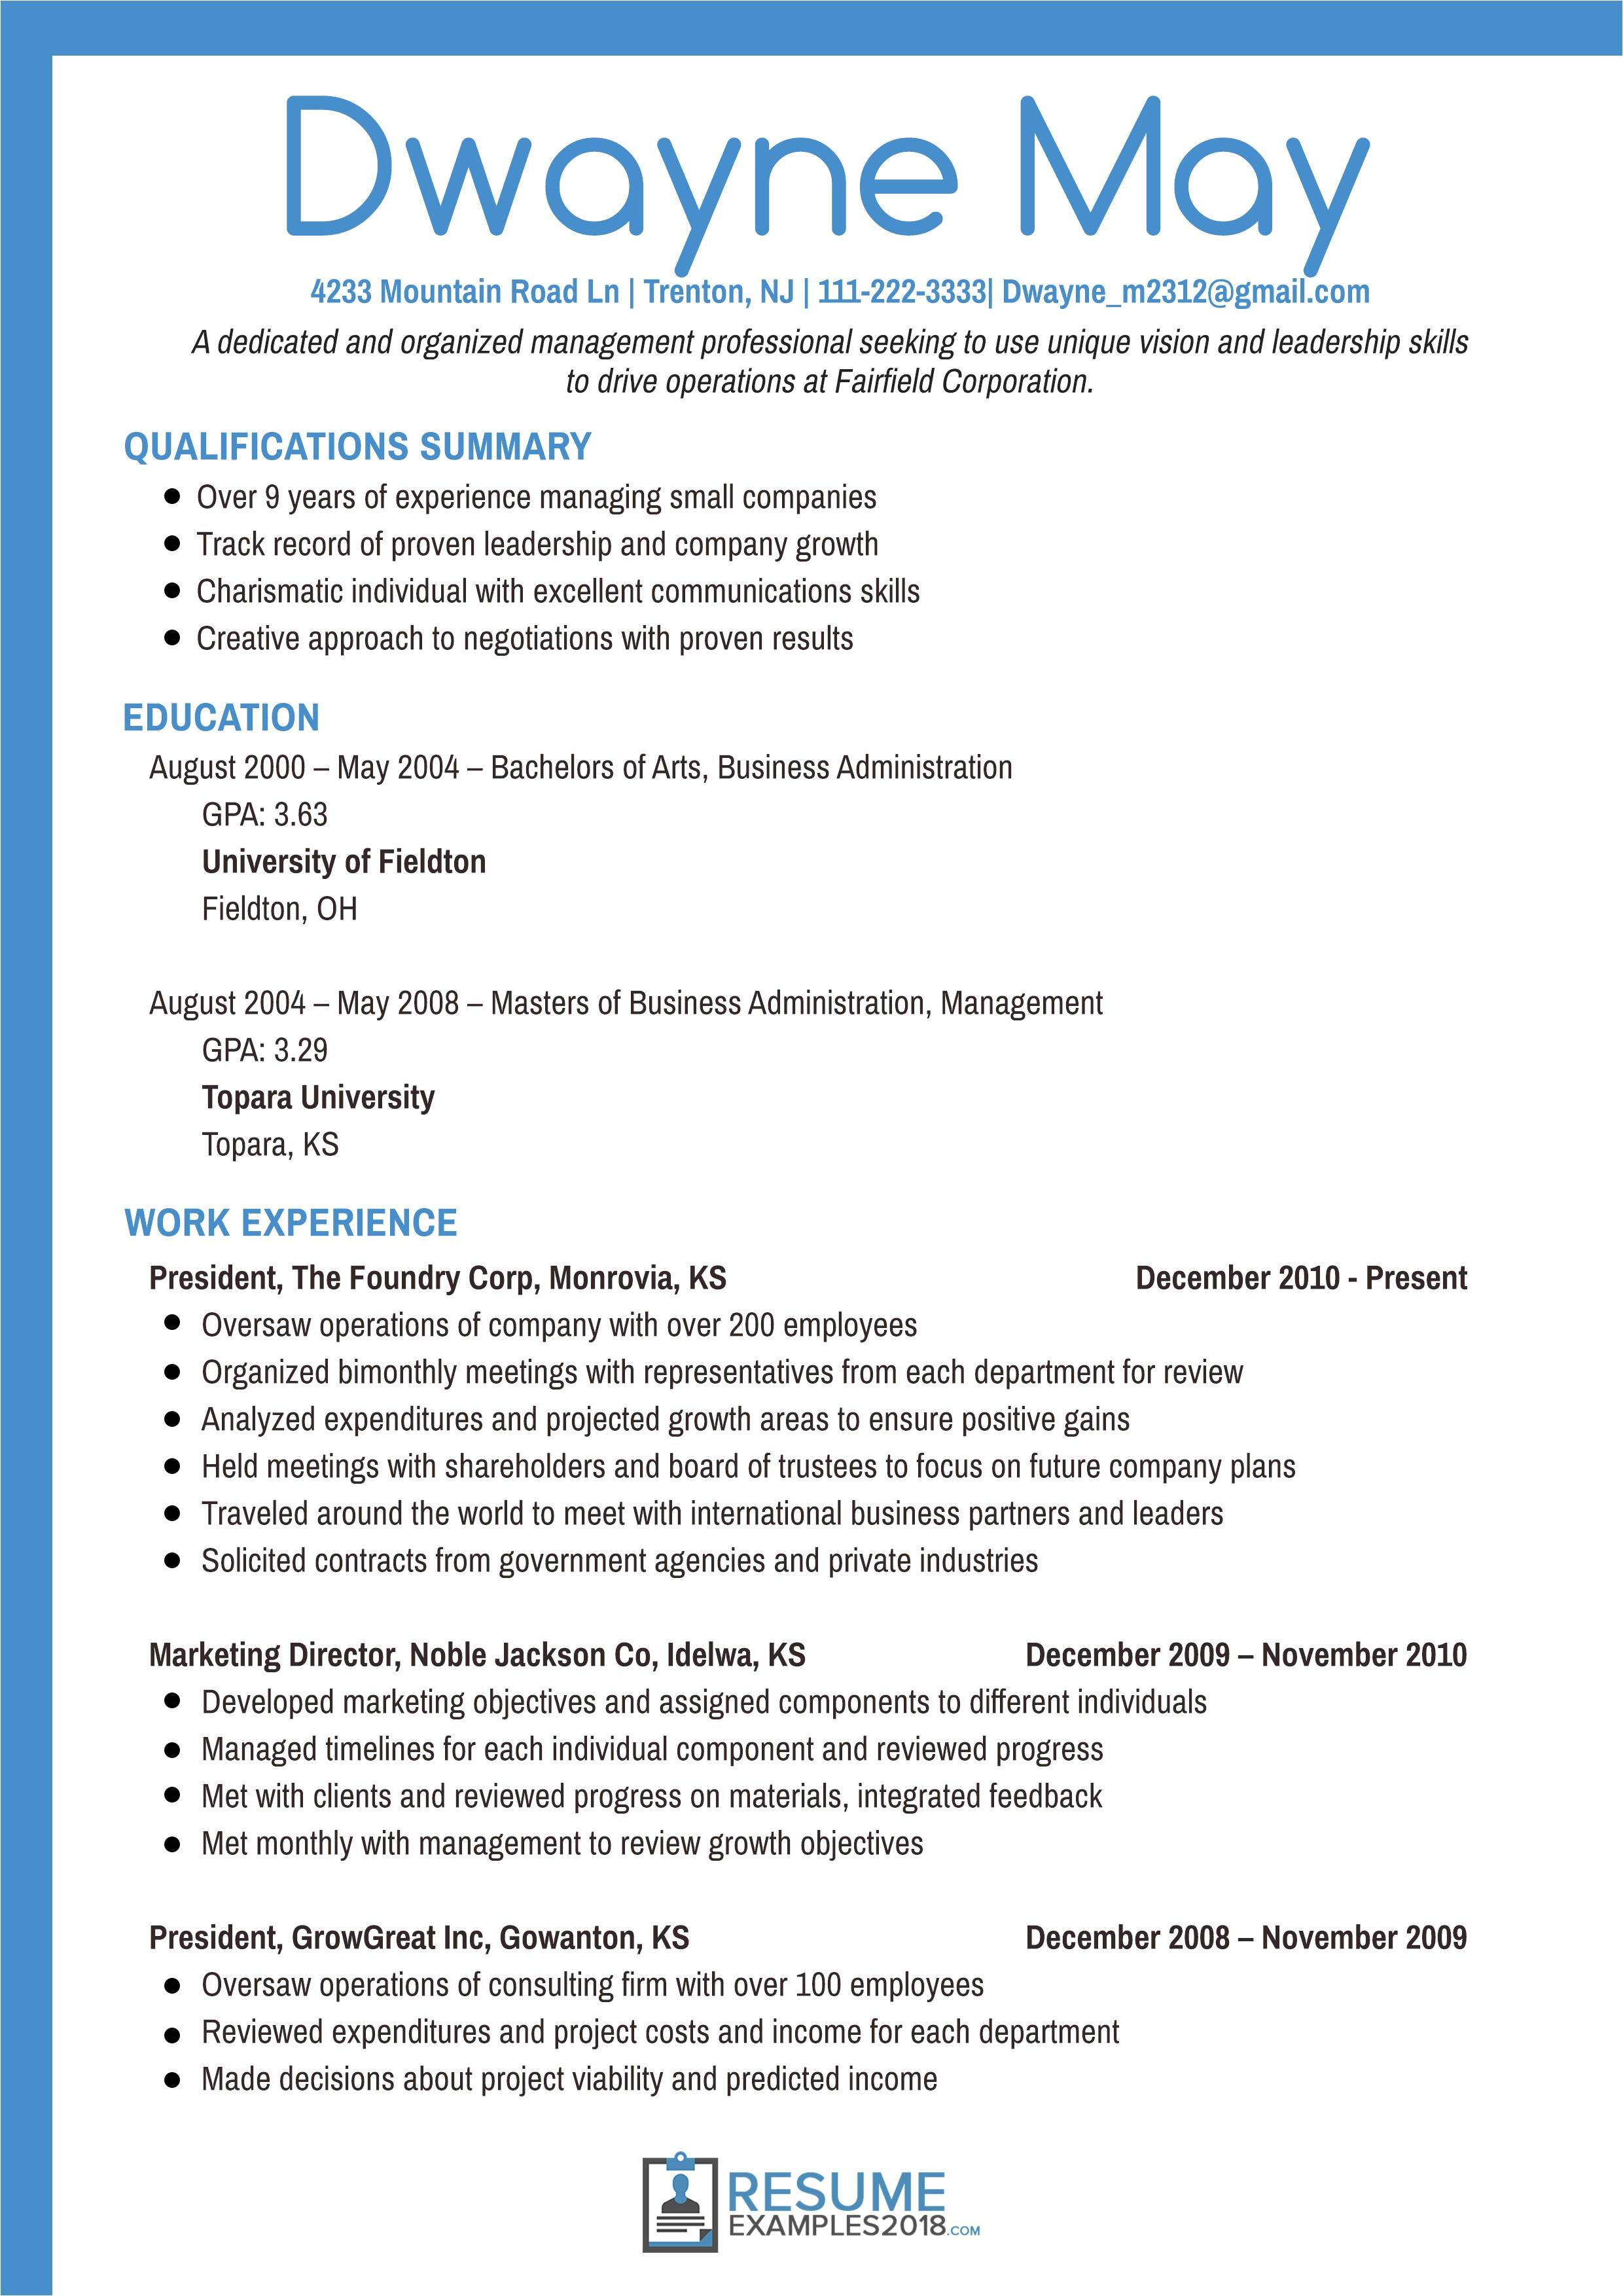 executive resume examples 2018